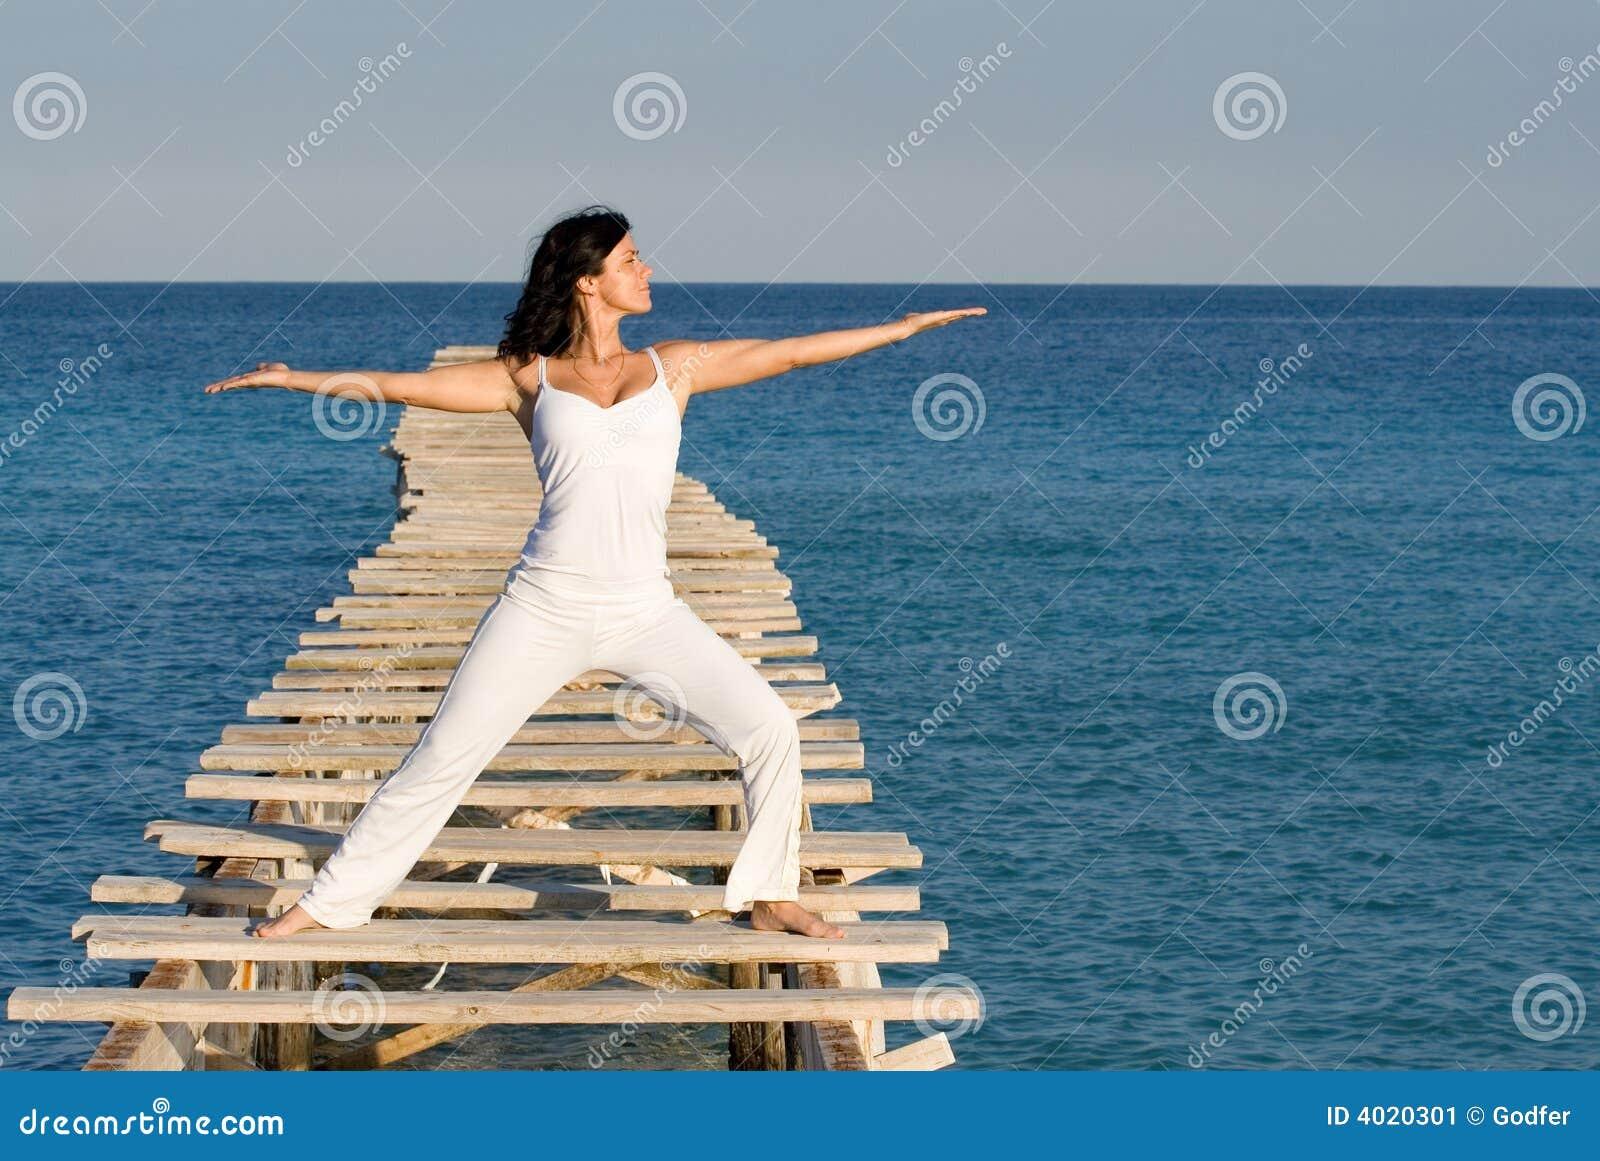 Vrouw die yoga of tai chi doet